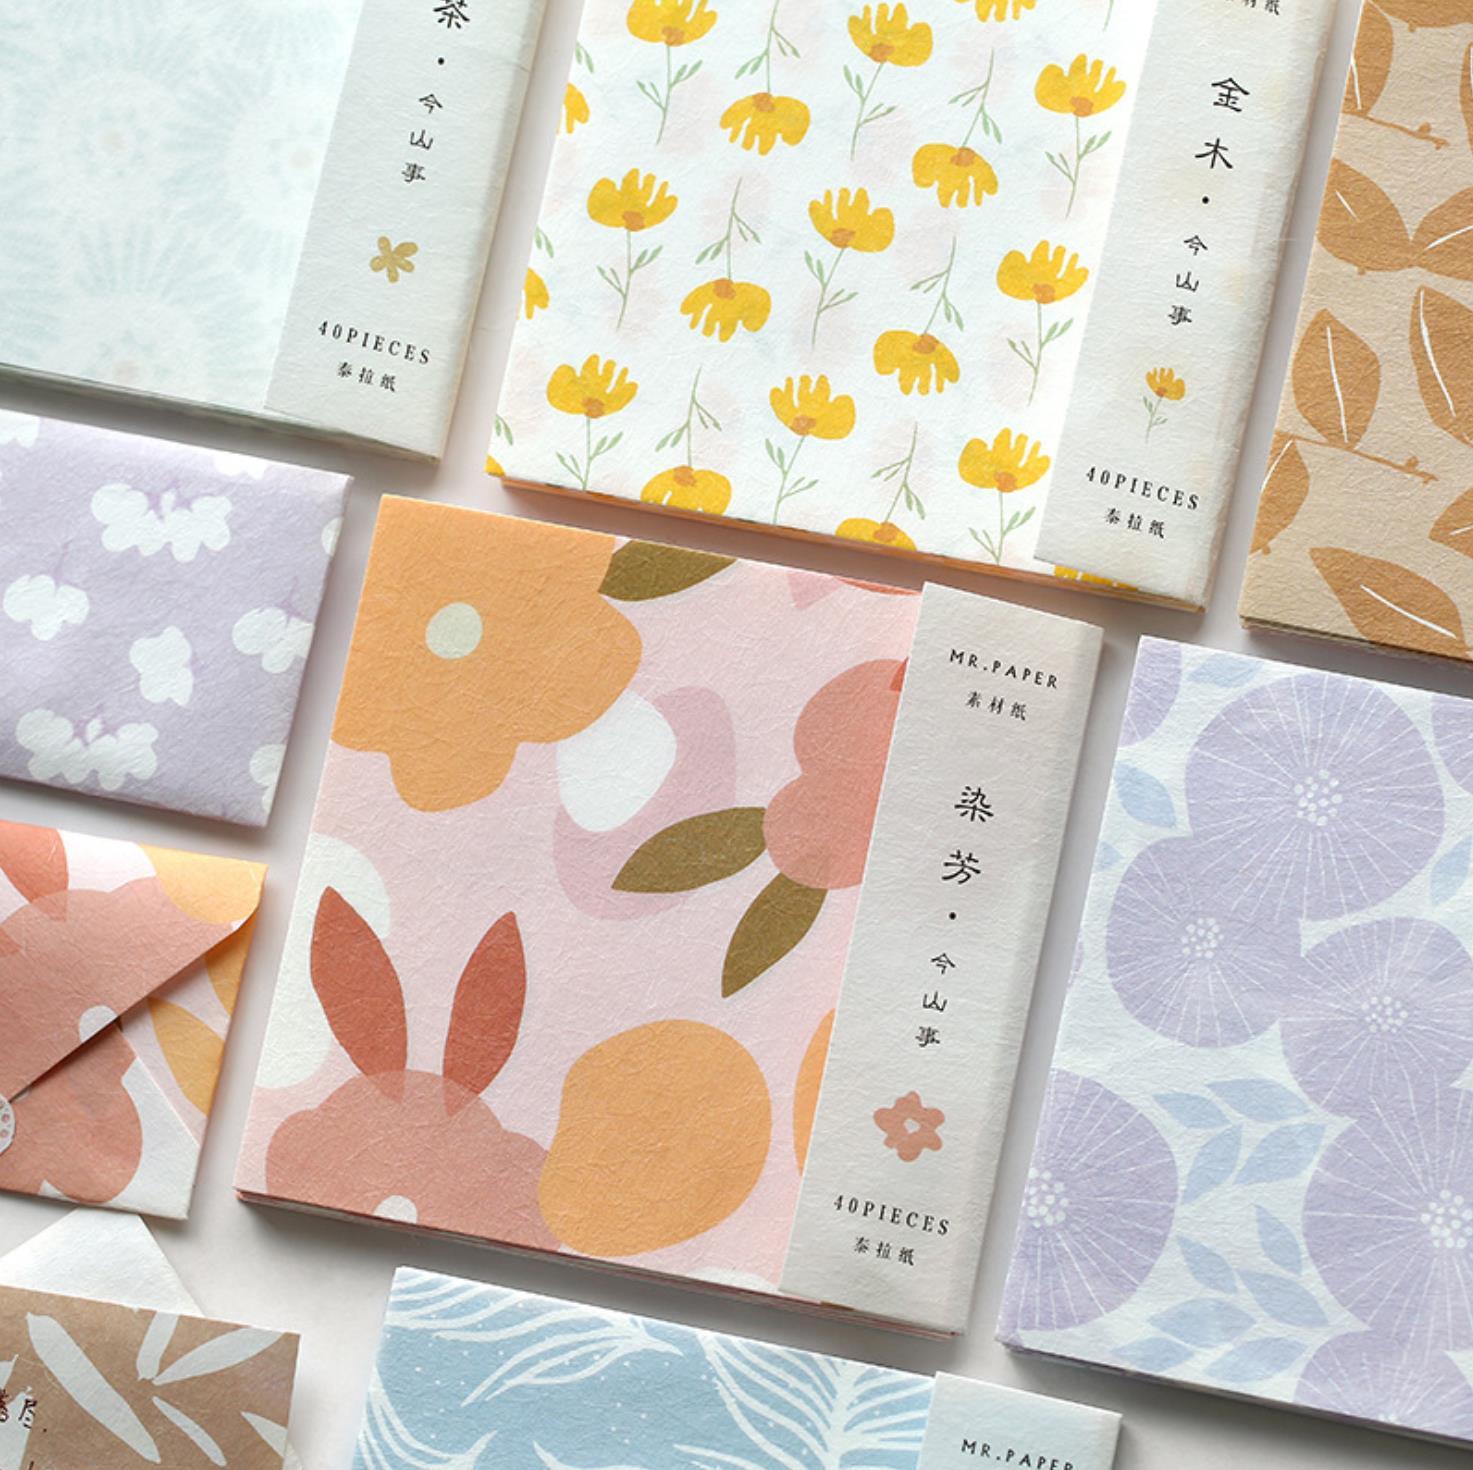 TUNACOCO 40 Sheets Japan Style SAKURA Kawaii Cute Mano Pad Sticky Note For Child Student Office Suplies Diary Bz1710144